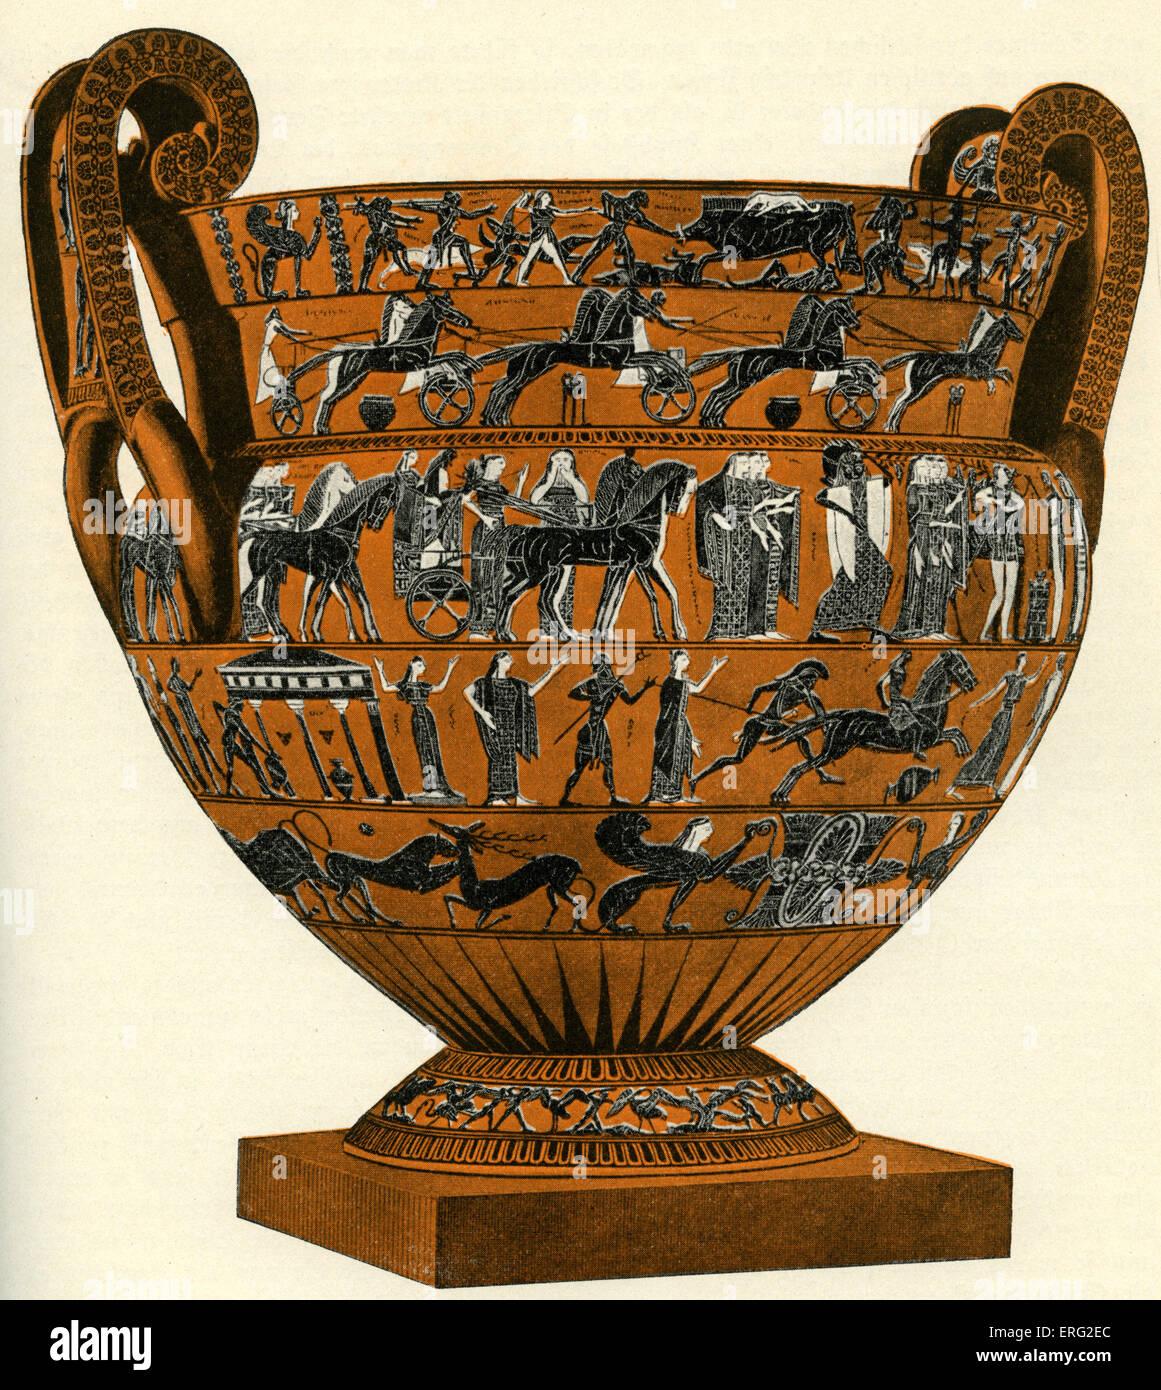 Black figure vase.  Krater by Ergotimos and Klitias of Athens, circa 6th century BCE. - Stock Image